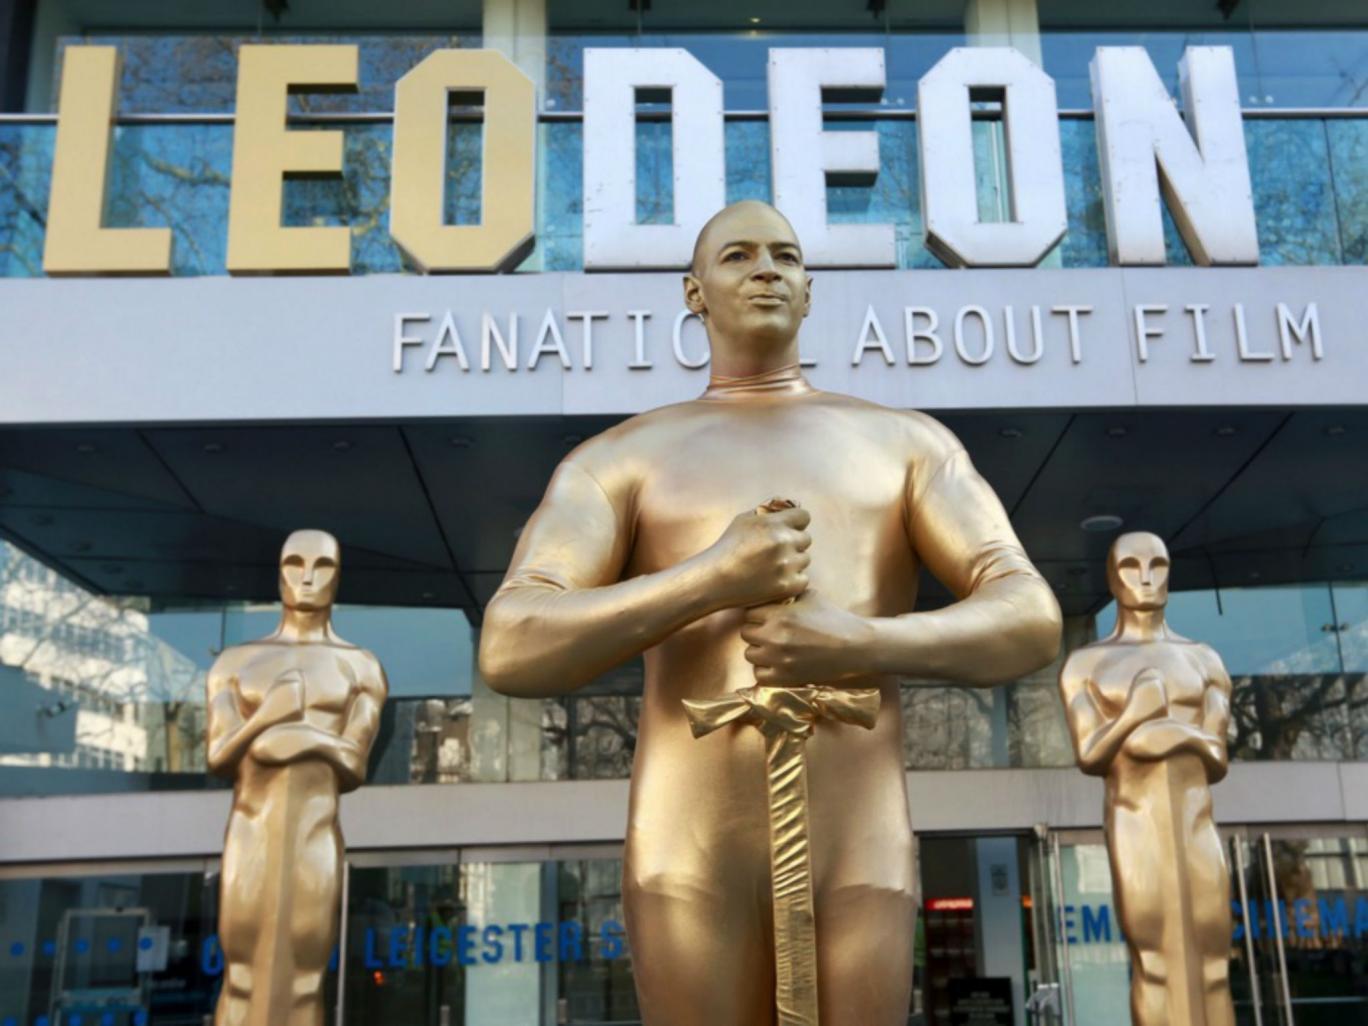 Леонардо ди Каприо запретил общаться с ним на тему «Оскара»